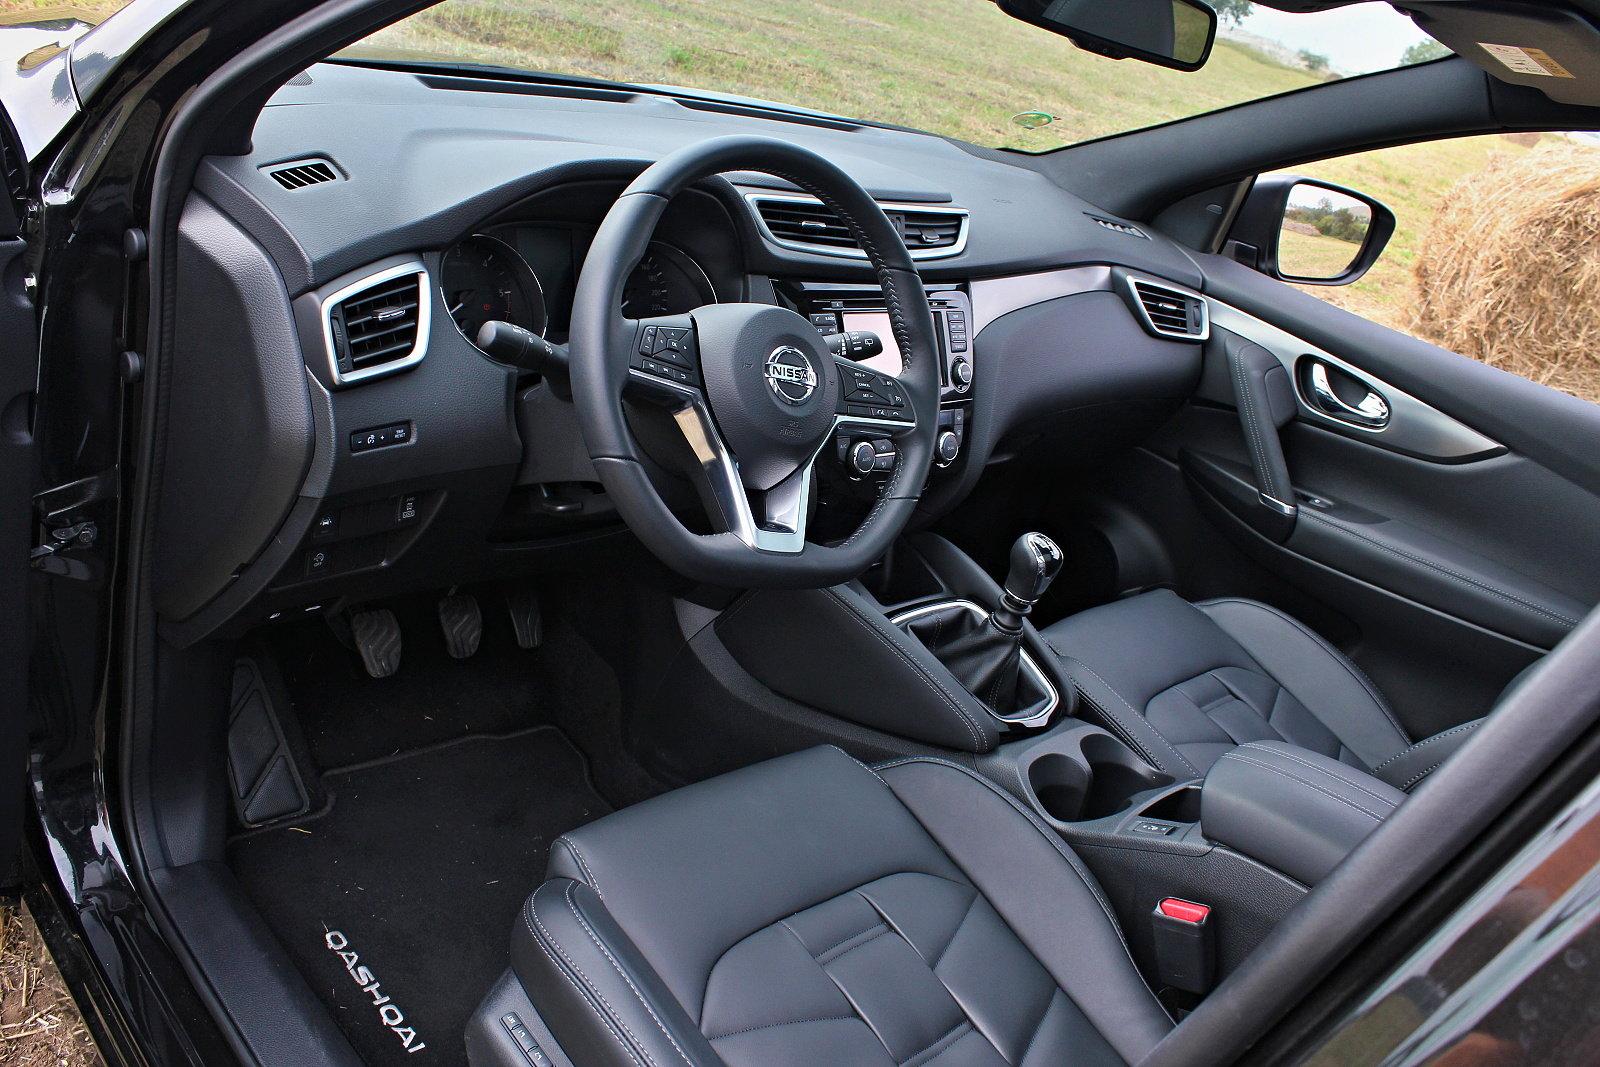 Nissan Qashqai dCi 130 All Mode 4x4-i